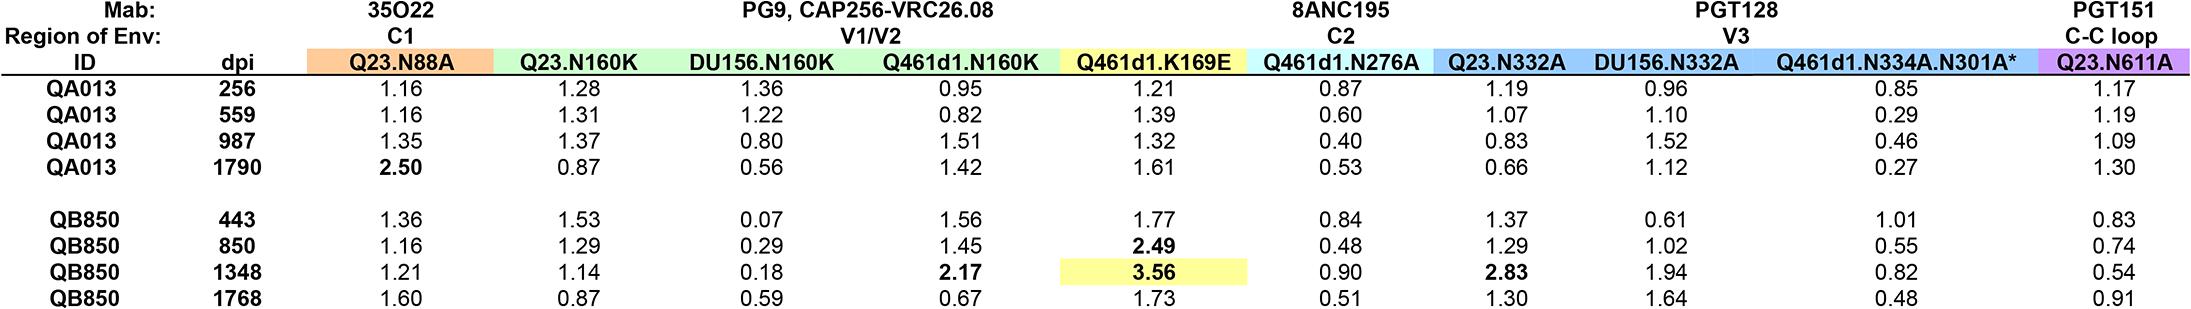 Longitudinal analysis of epitope targets in QB850 and QA013 plasma.